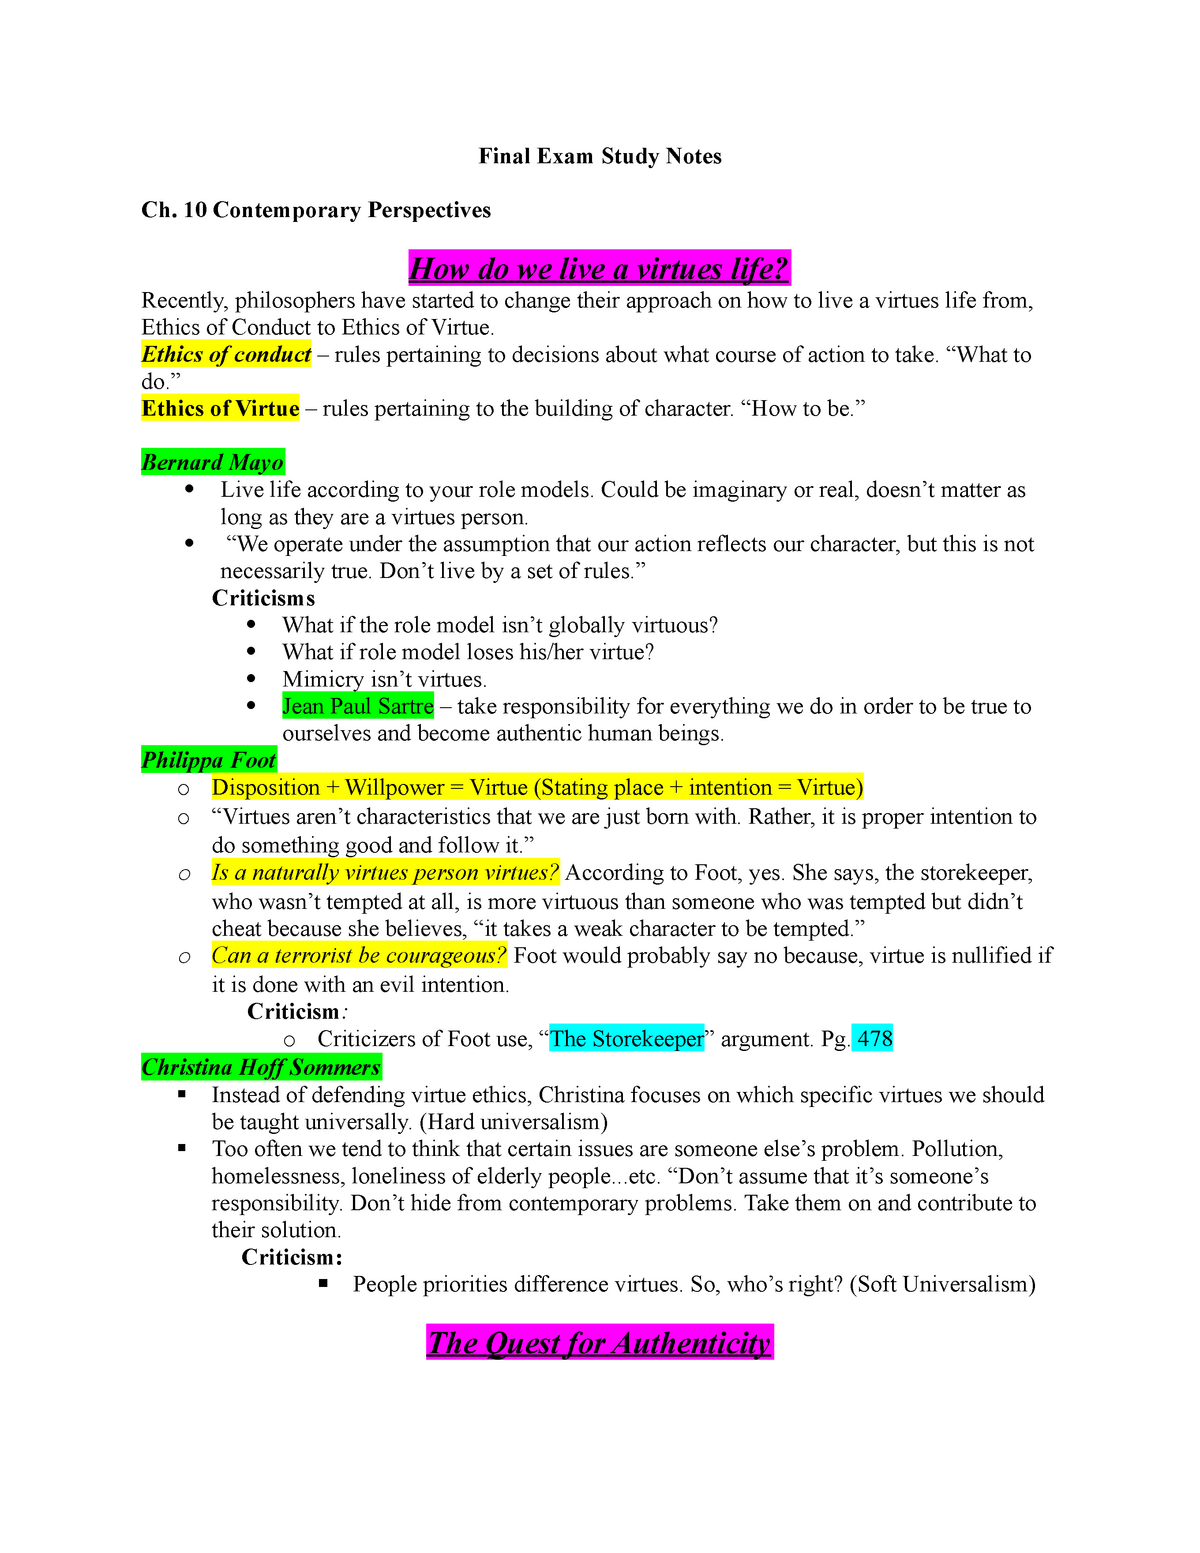 Summary PHIL 230E PHIL 230E 16 Jun 2019 - StuDocu